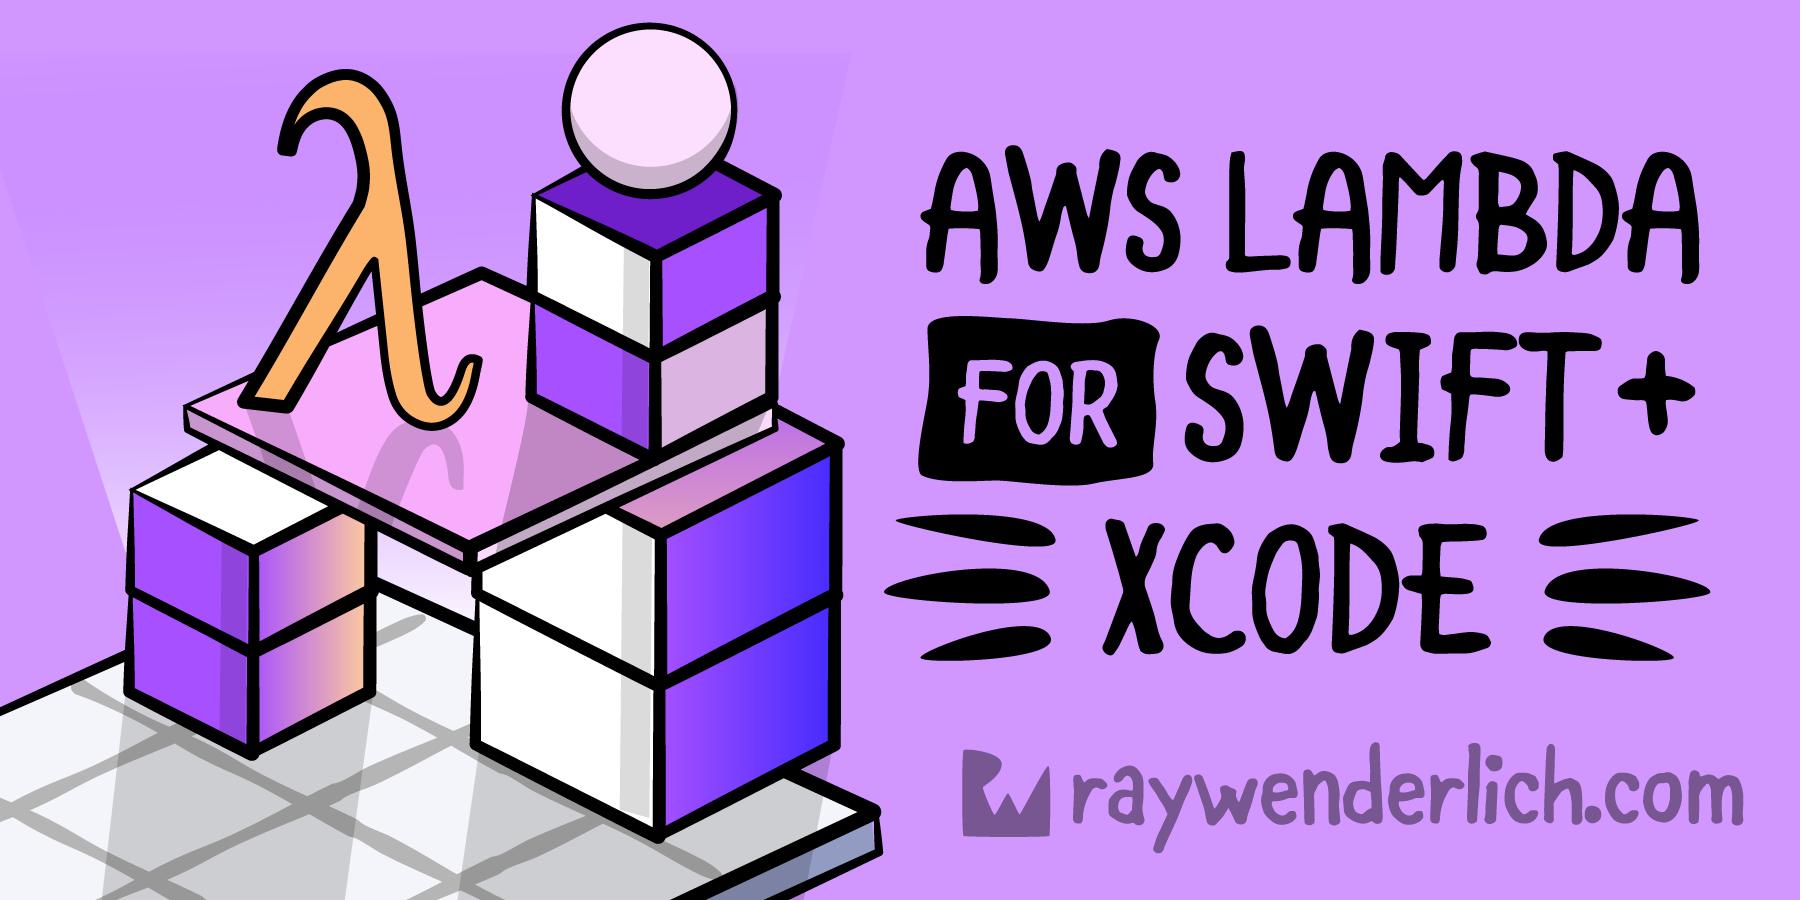 AWS Lambda Tutorial for Swift: Getting Started [FREE] - RapidAPI